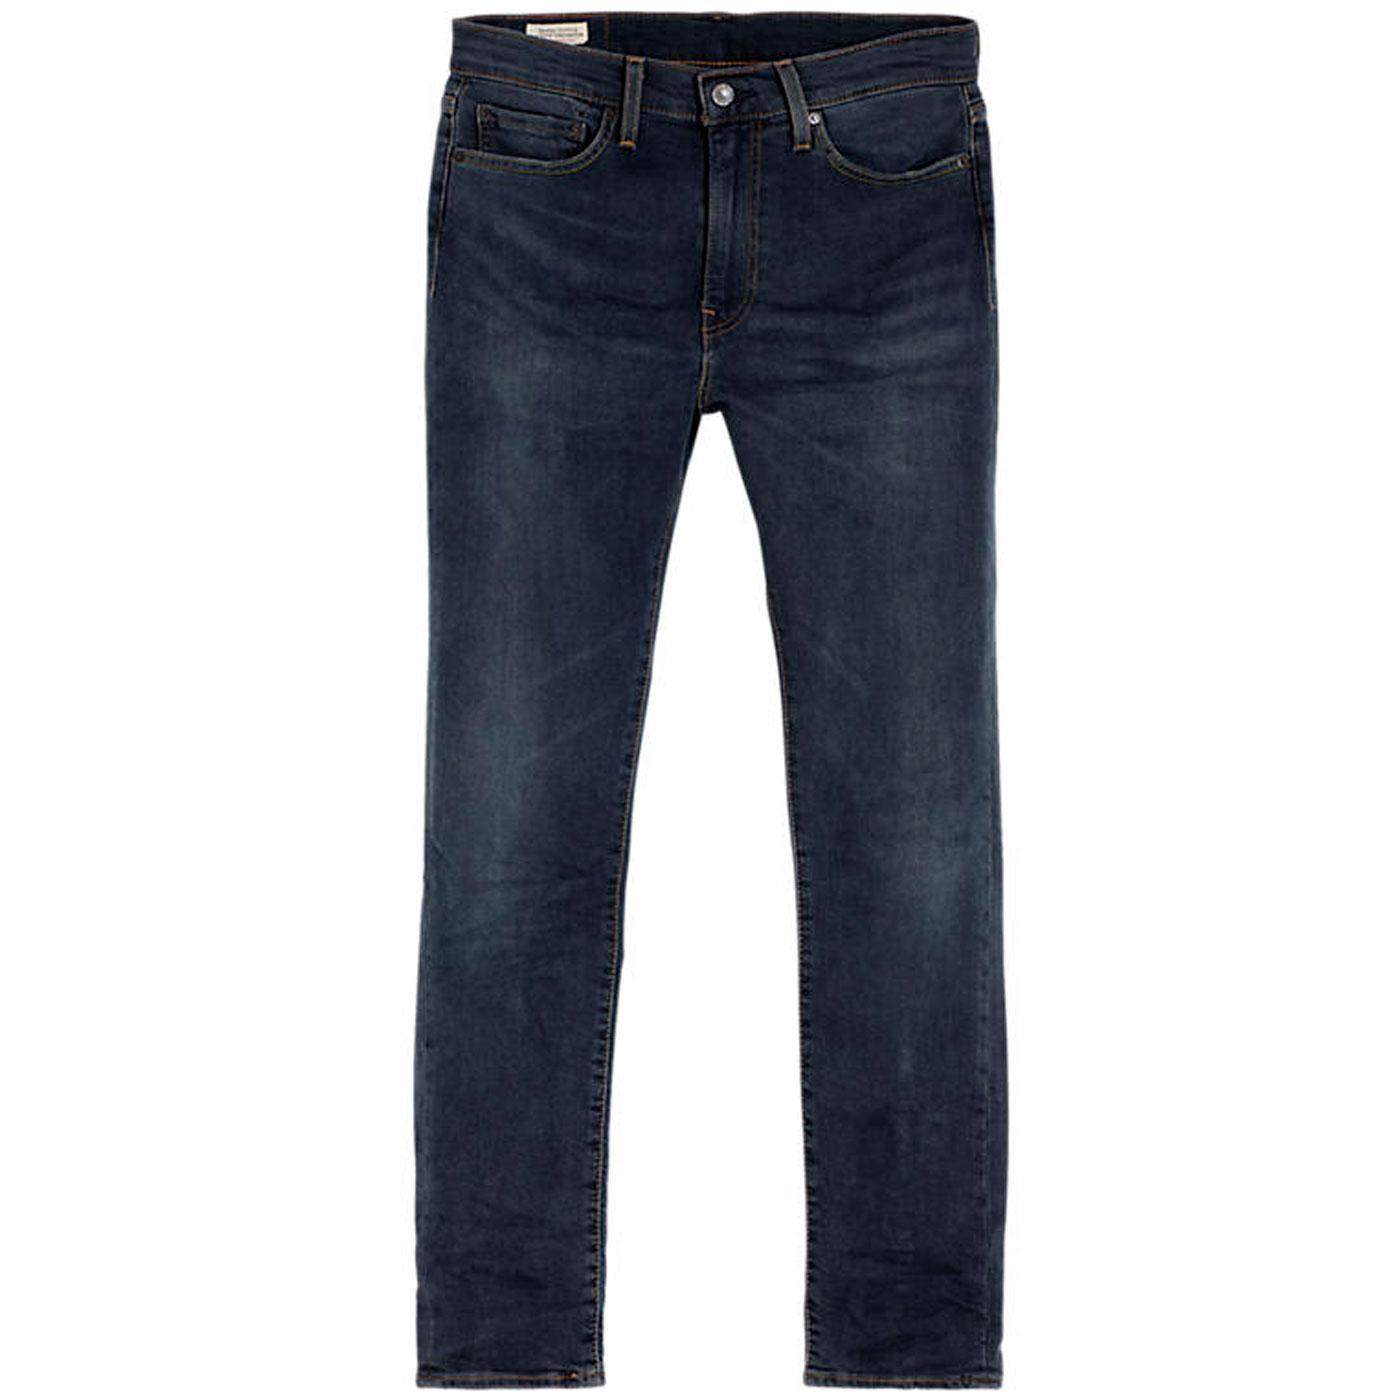 LEVI'S 511 Men's Mod Slim Denim Jeans (Ivy Adv)